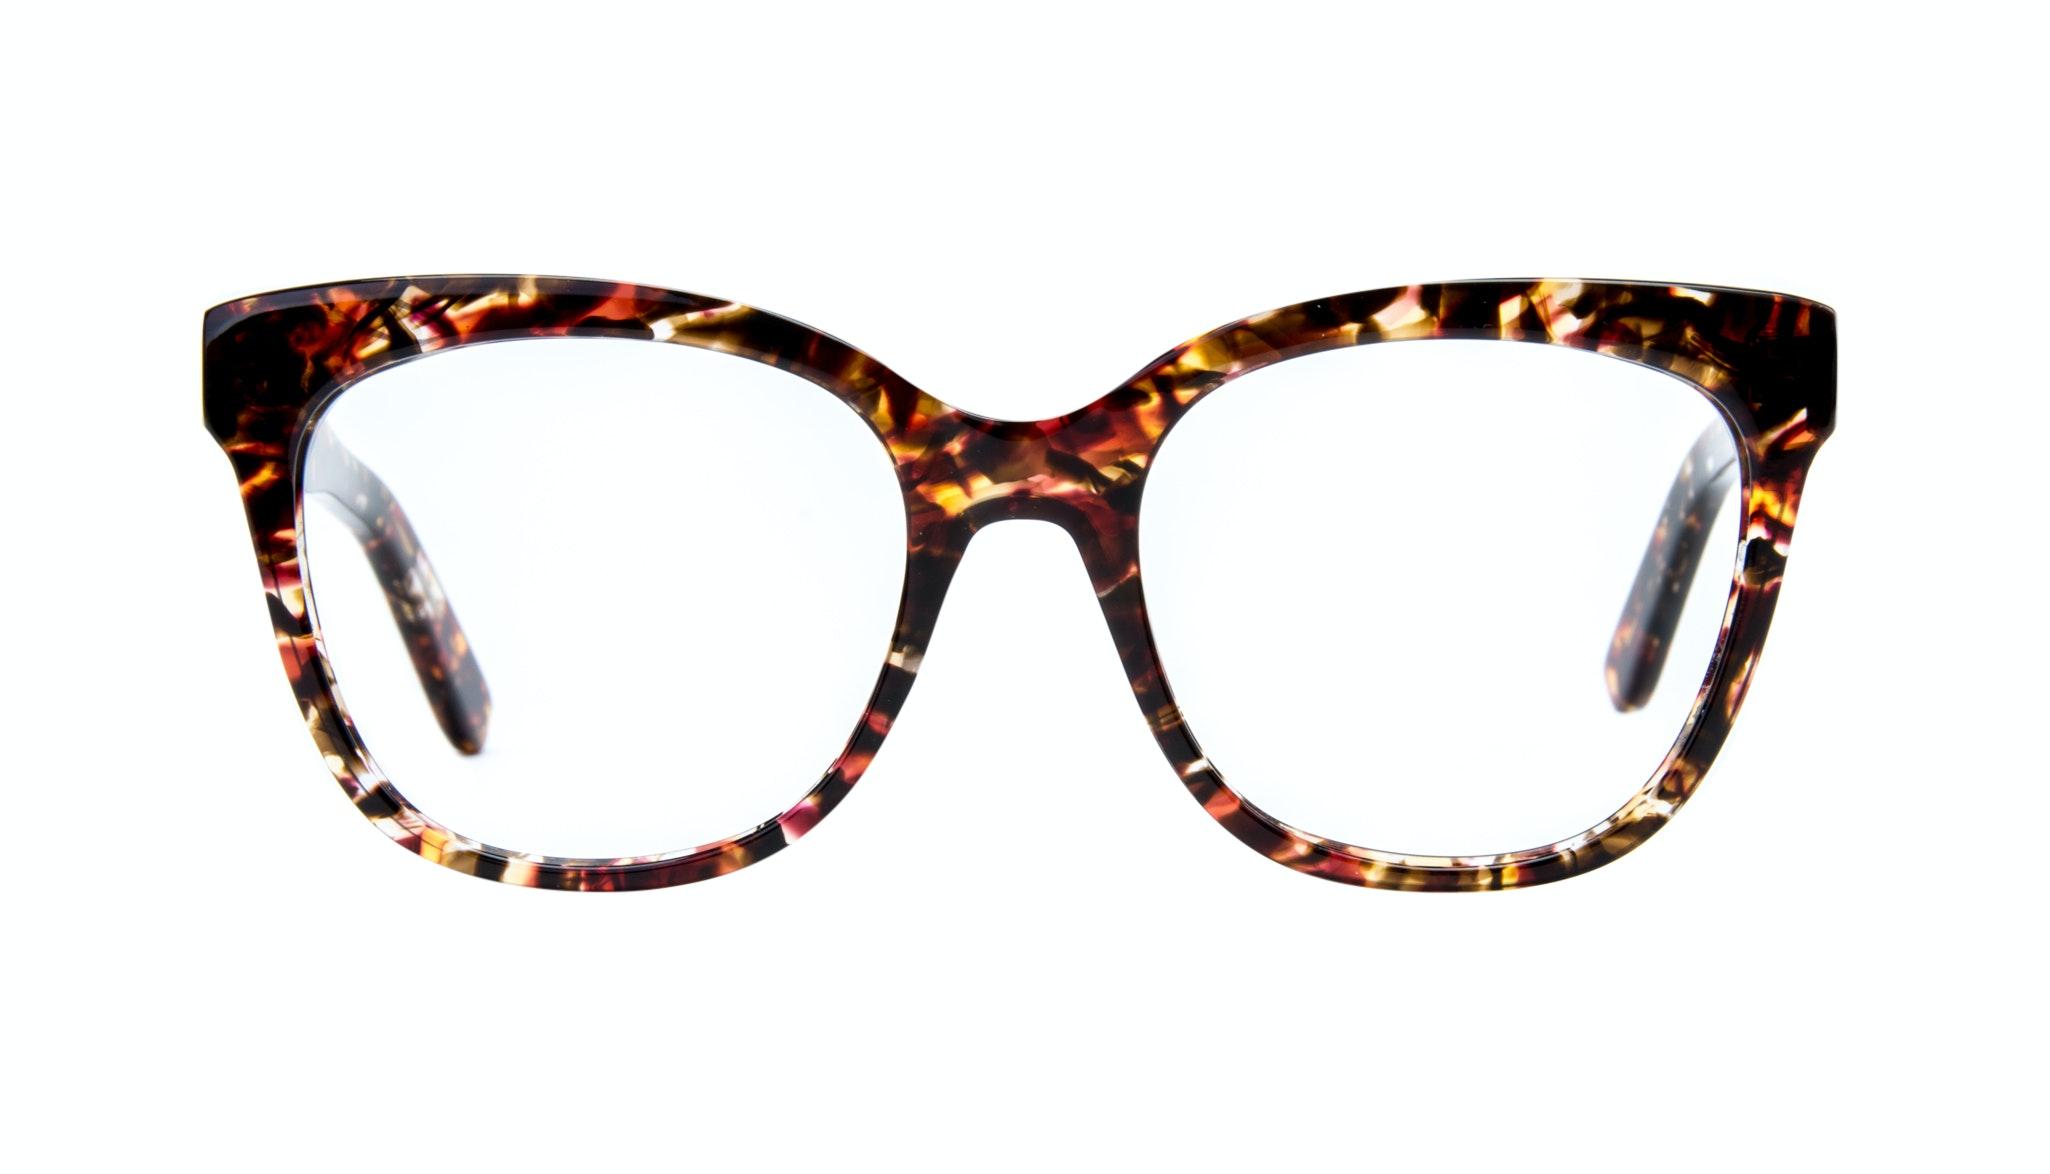 Affordable Fashion Glasses Square Eyeglasses Women Breezy Lava Front